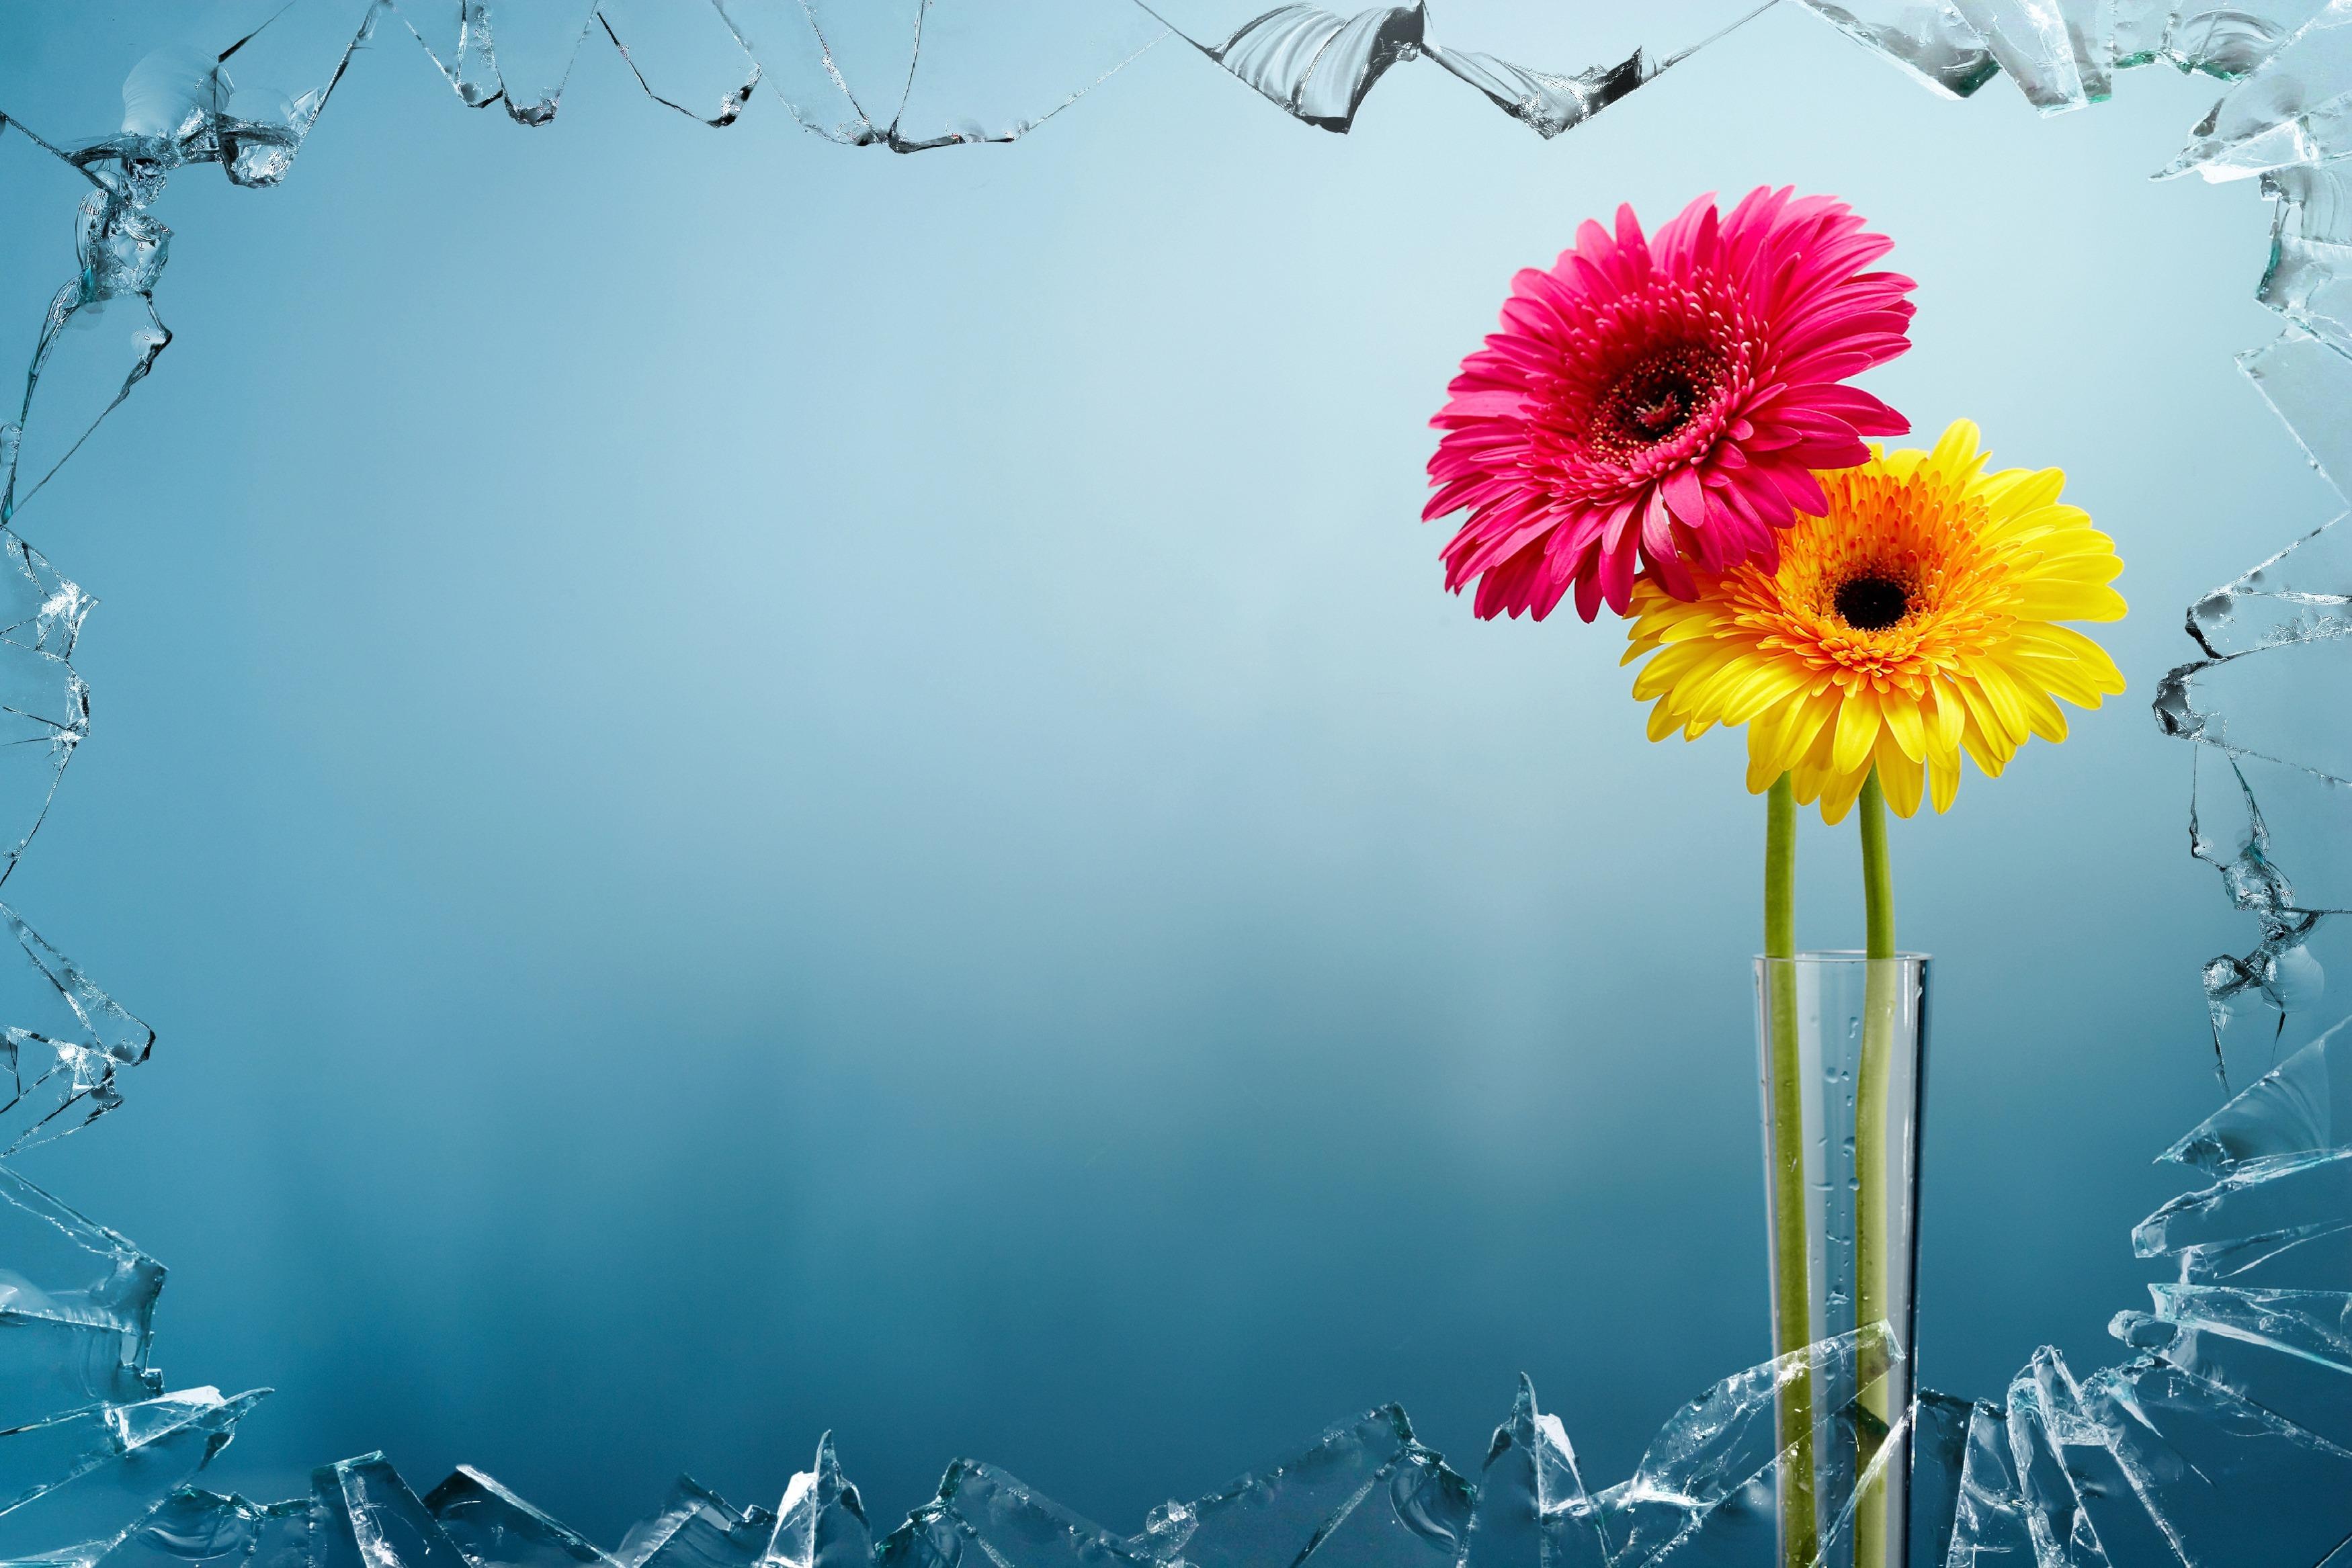 artwork-colorful-art-flowers-68604.jpeg (3500×2334)